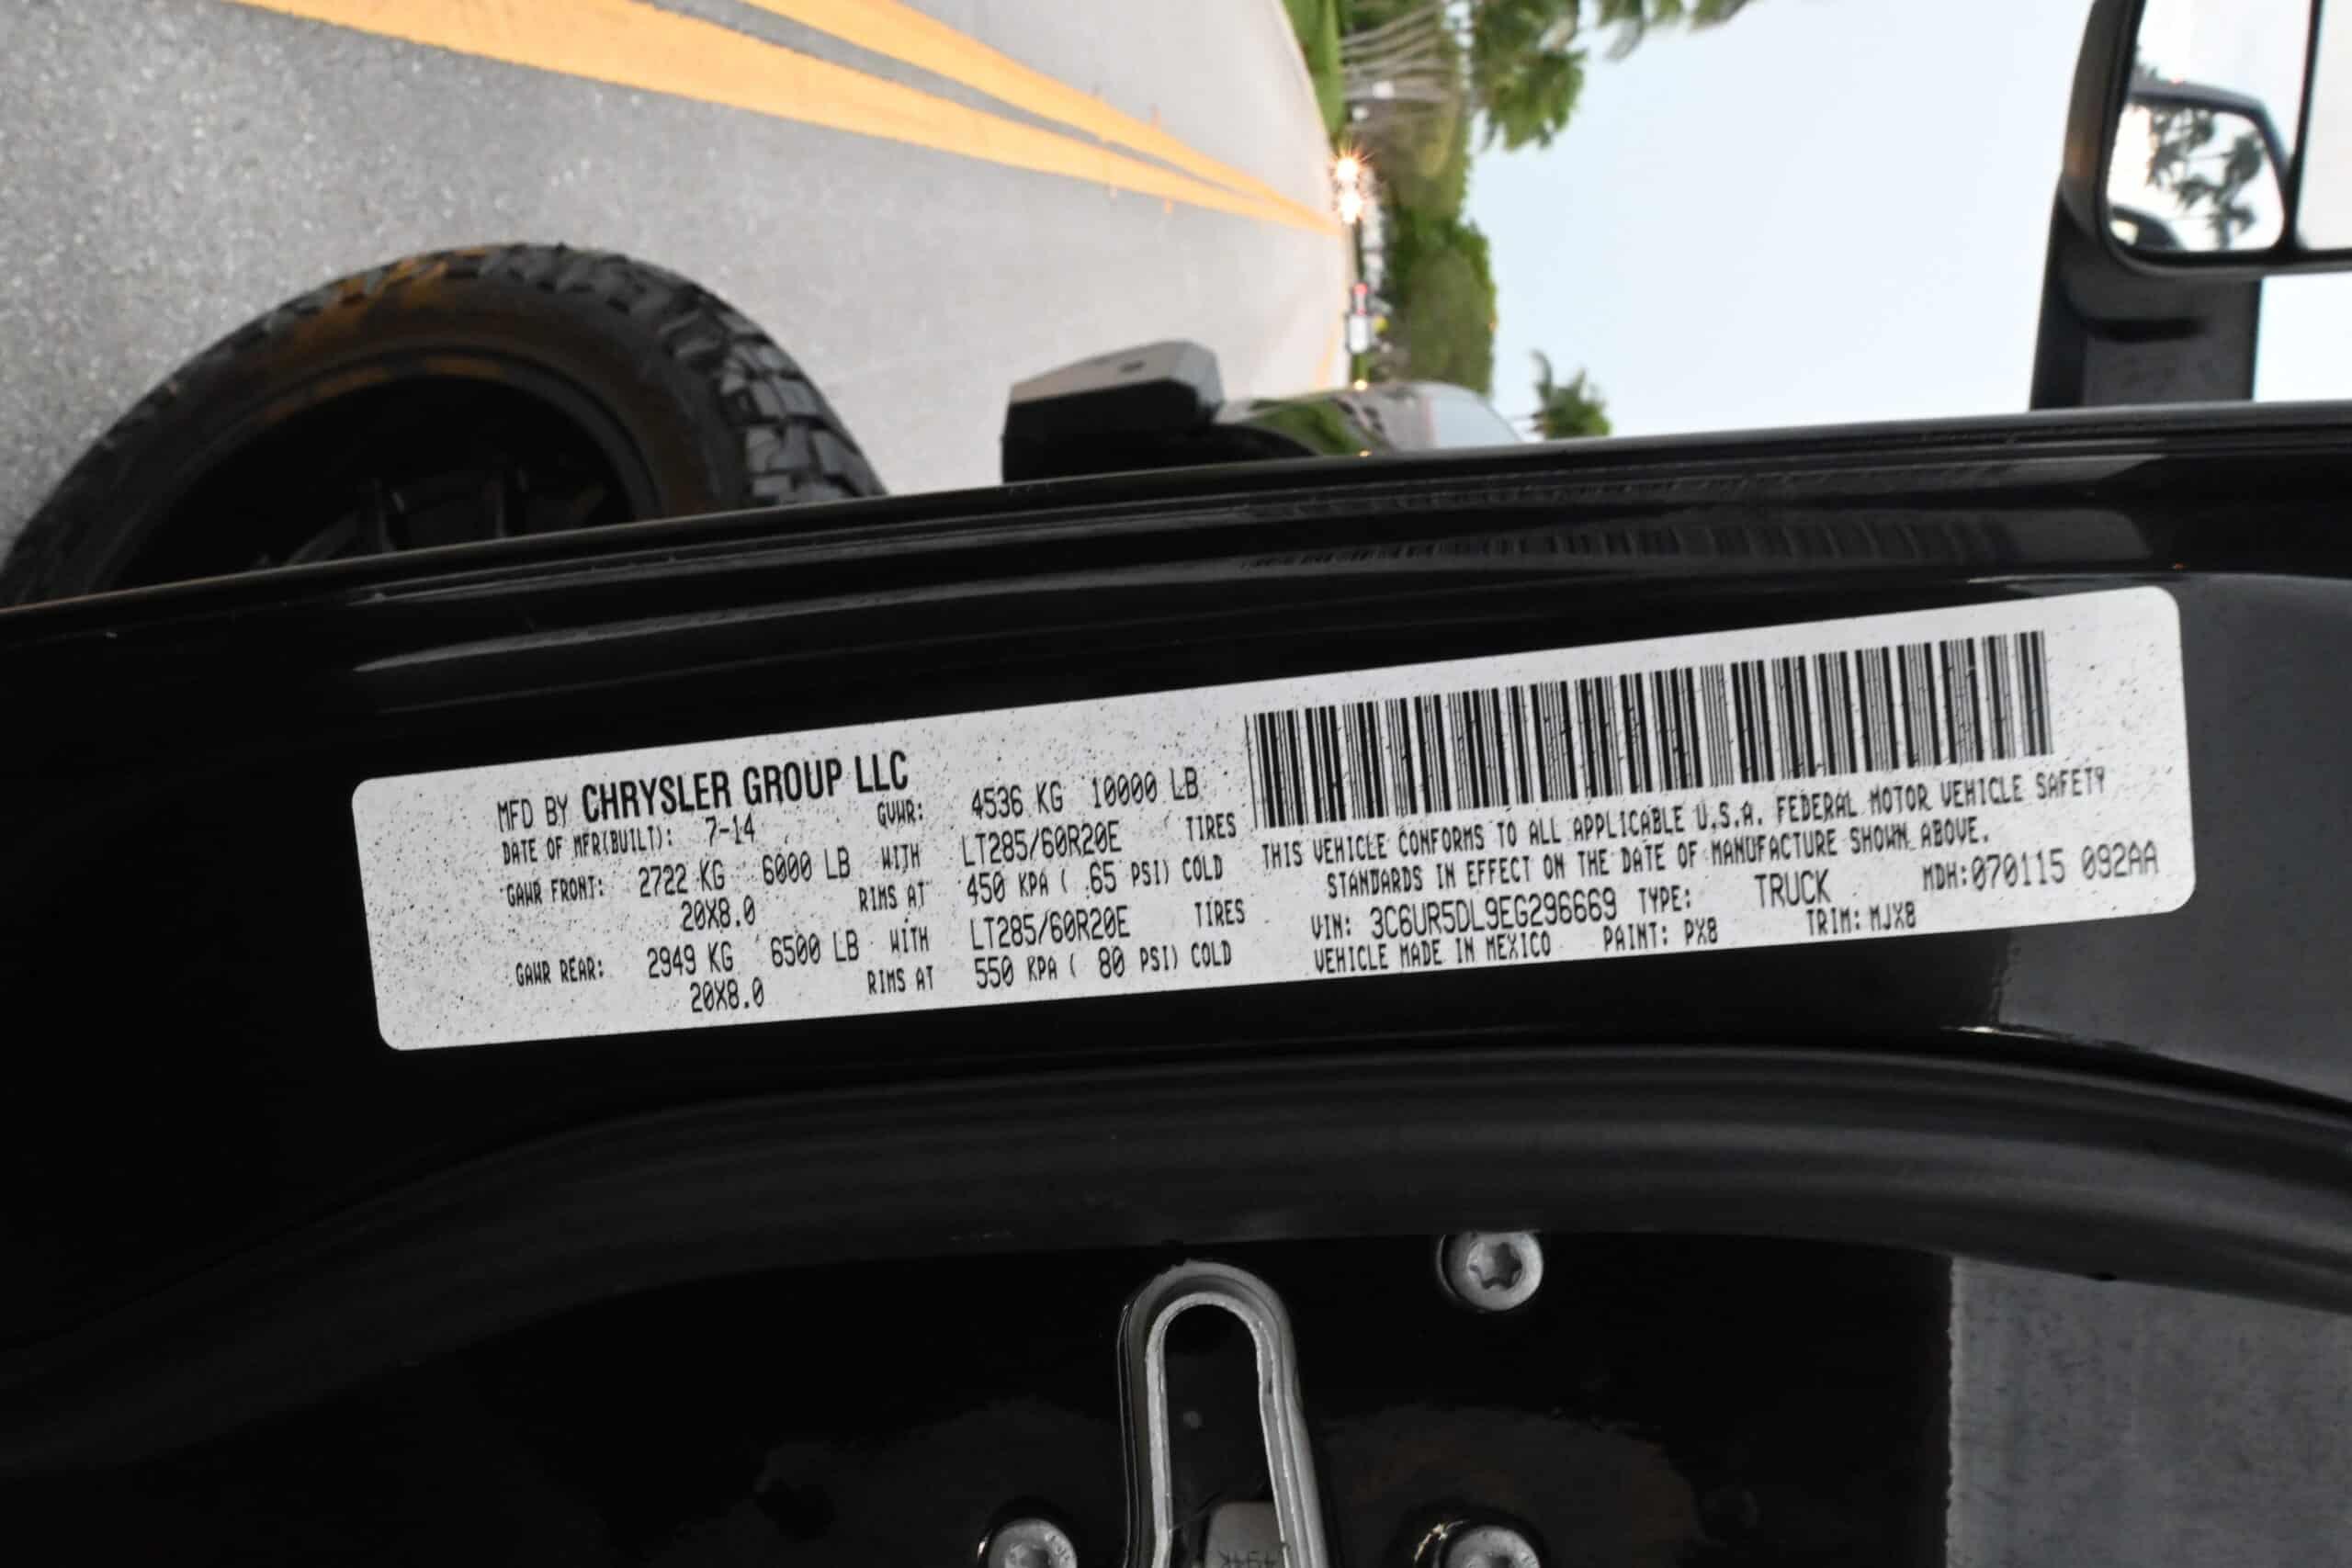 2014 Dodge Ram 2500 Big Horn Crew Cab 4×4 6.7L Cummins Turbo Diesel – Built Motor/ Trans – BDS 8 inch lift – 5 Stage Tune